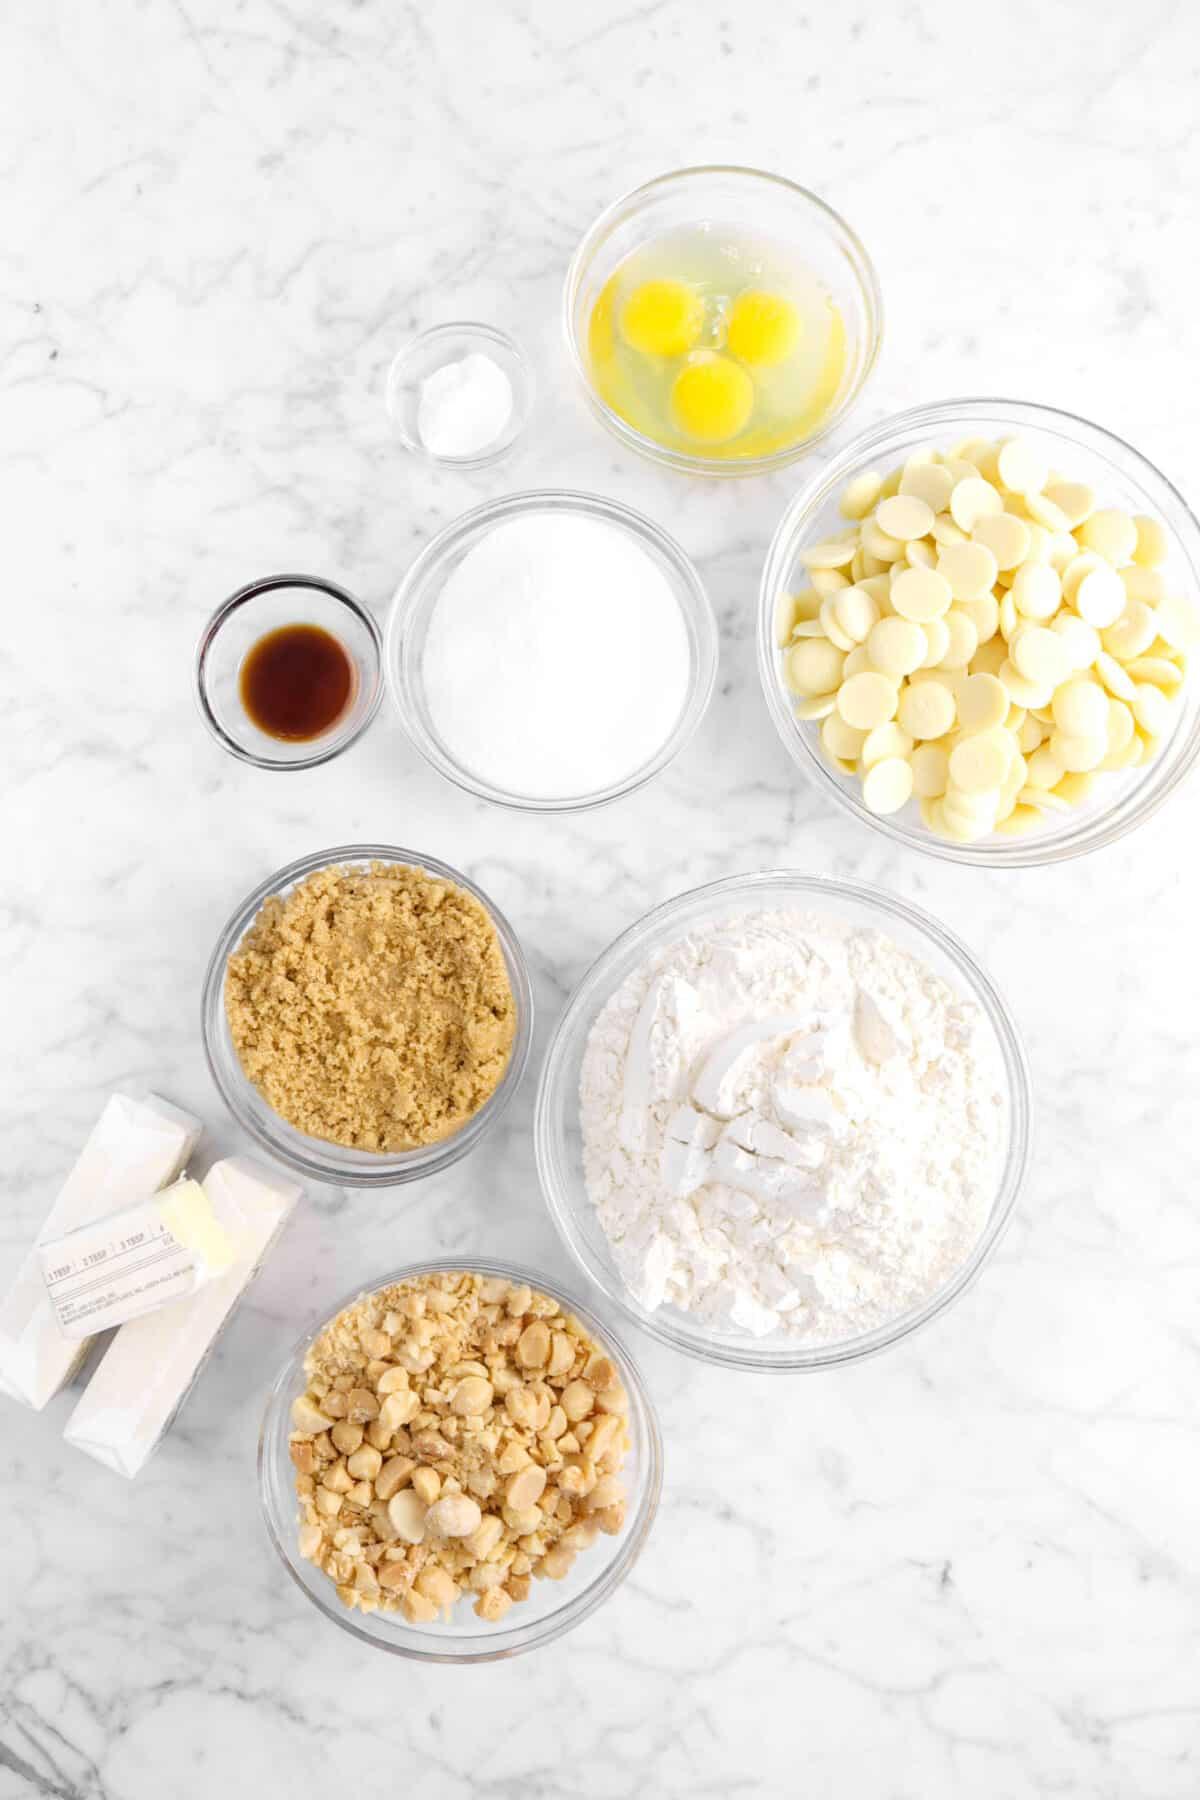 baking soda, eggs, white chocolate, sugar, vanilla, brown sugar, flour, chopped macadamia nuts, and butter on marble counter